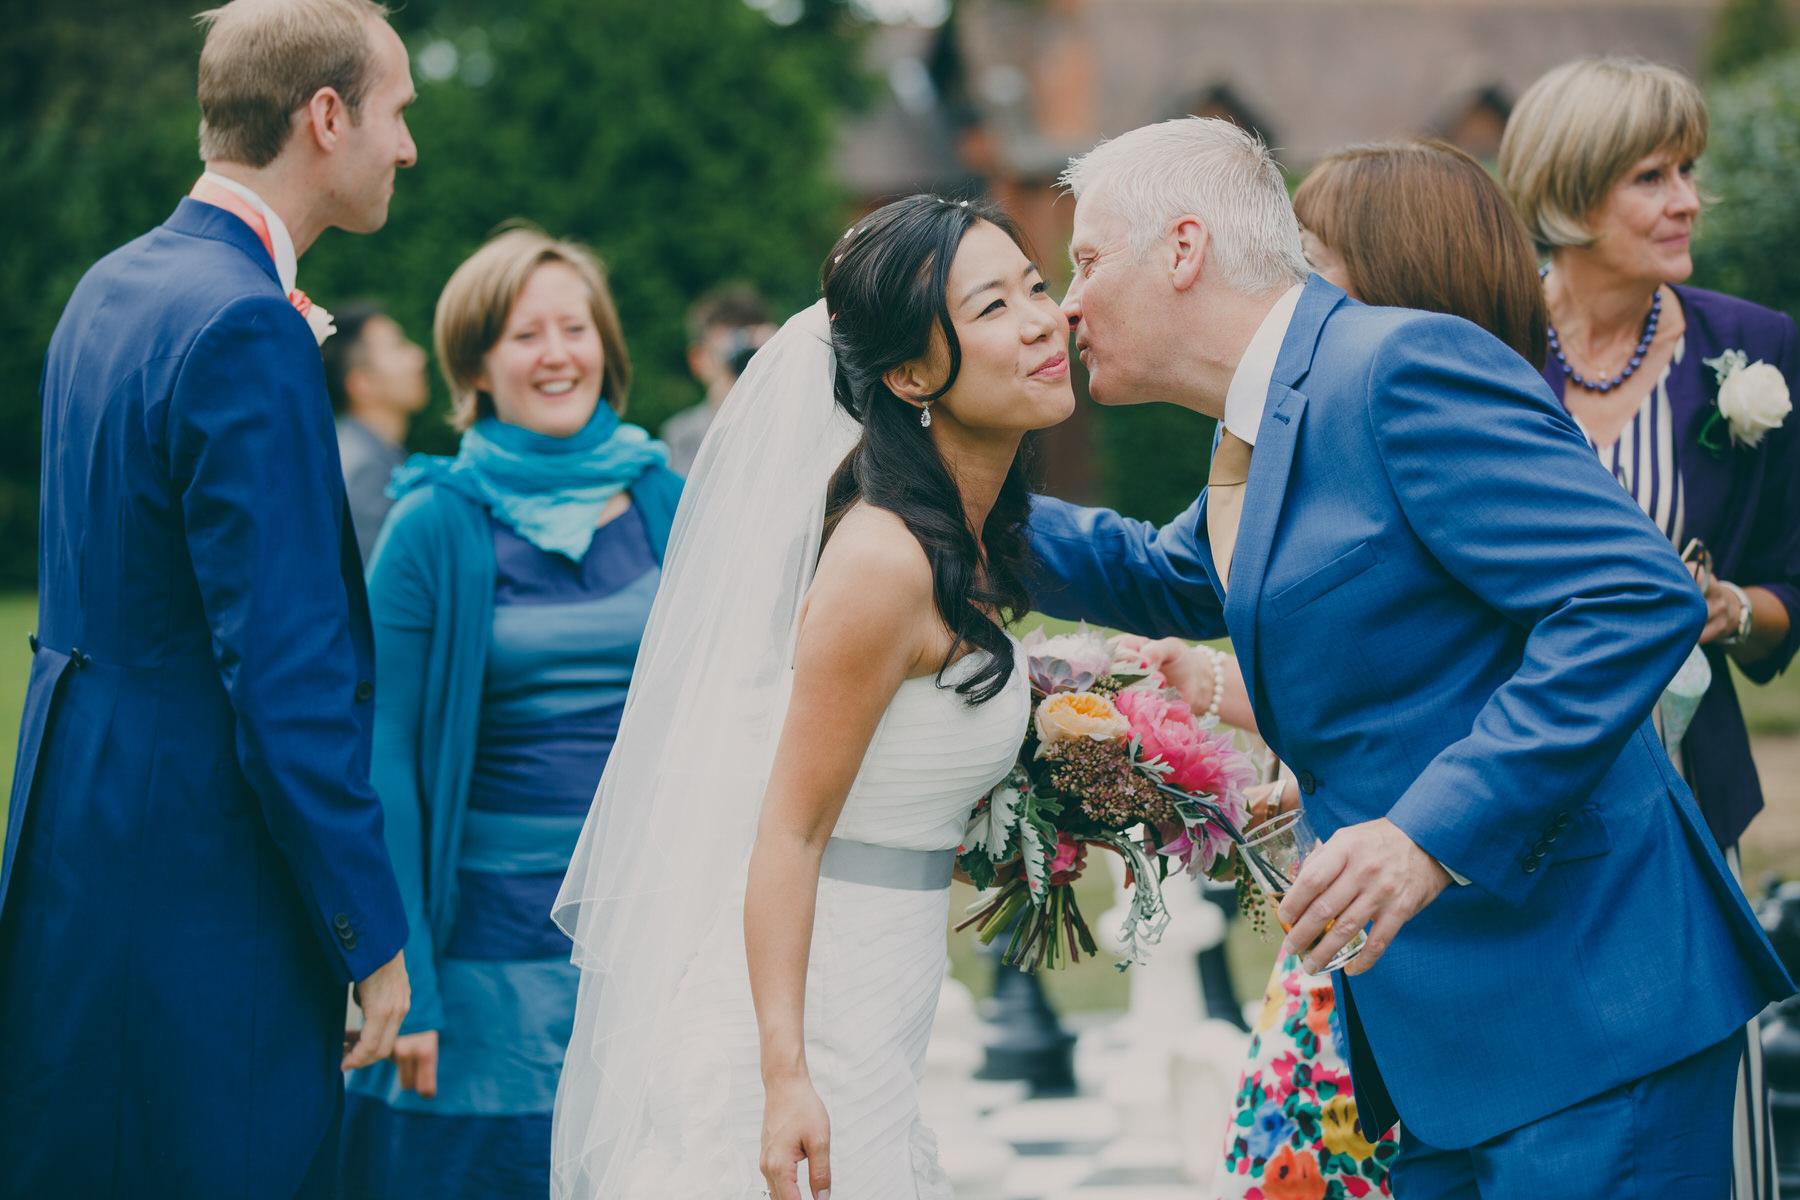 256 Surrey wedding reception drinks guest candid reportage.jpg